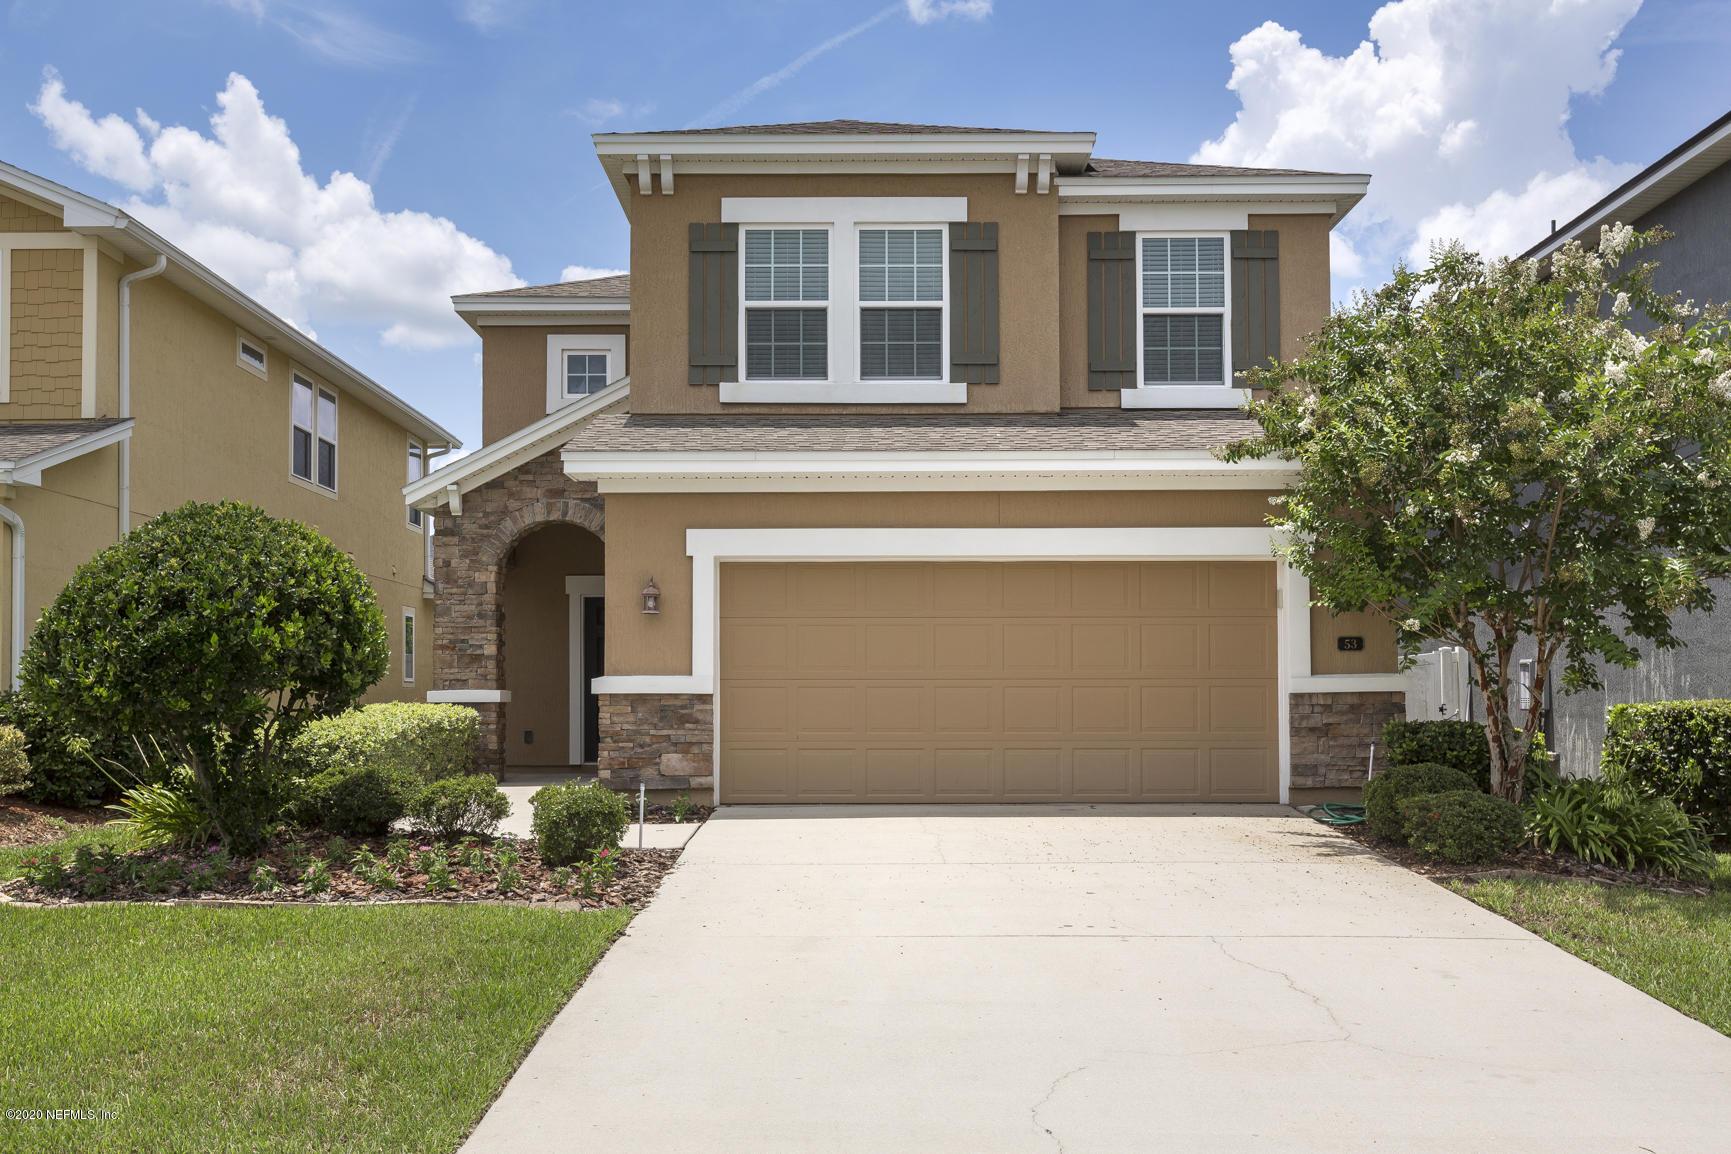 53 CARLSON, PONTE VEDRA, FLORIDA 32081, 3 Bedrooms Bedrooms, ,2 BathroomsBathrooms,Residential,For sale,CARLSON,1064884